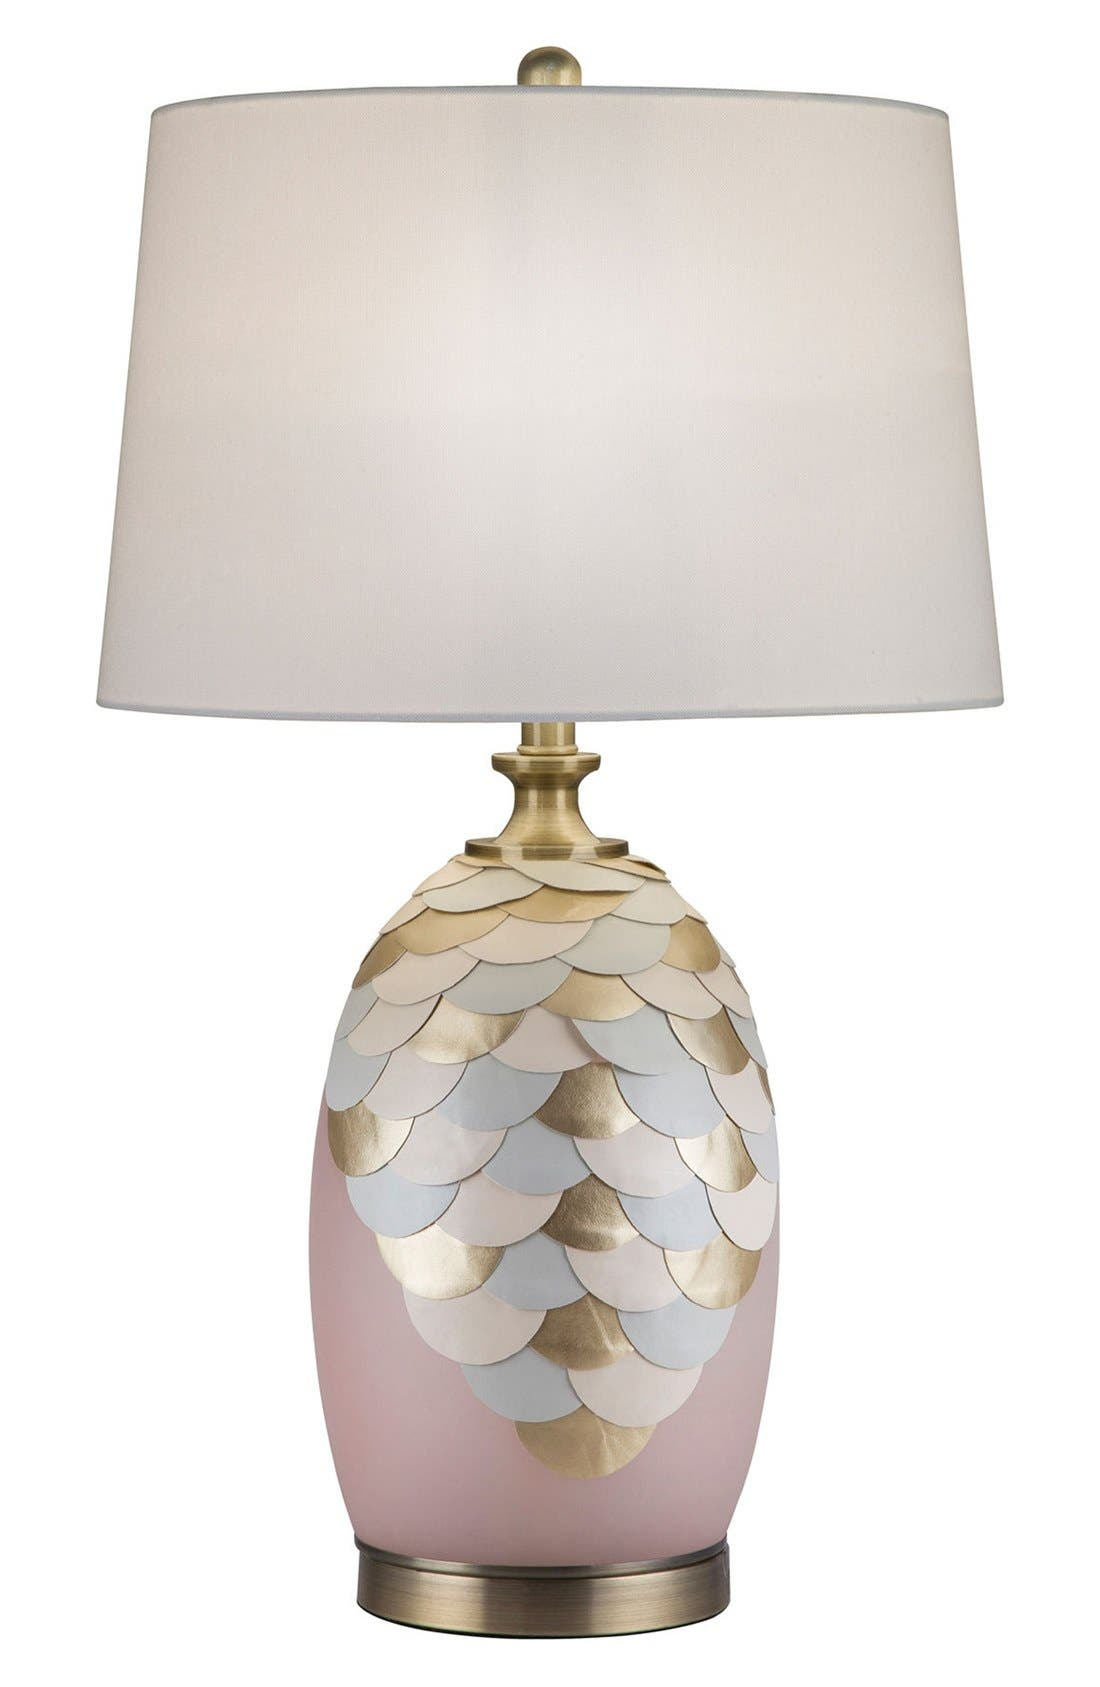 JAlexander Rose Quartz Table Lamp with Faux Leather & Brass Accents,                         Main,                         color, 650